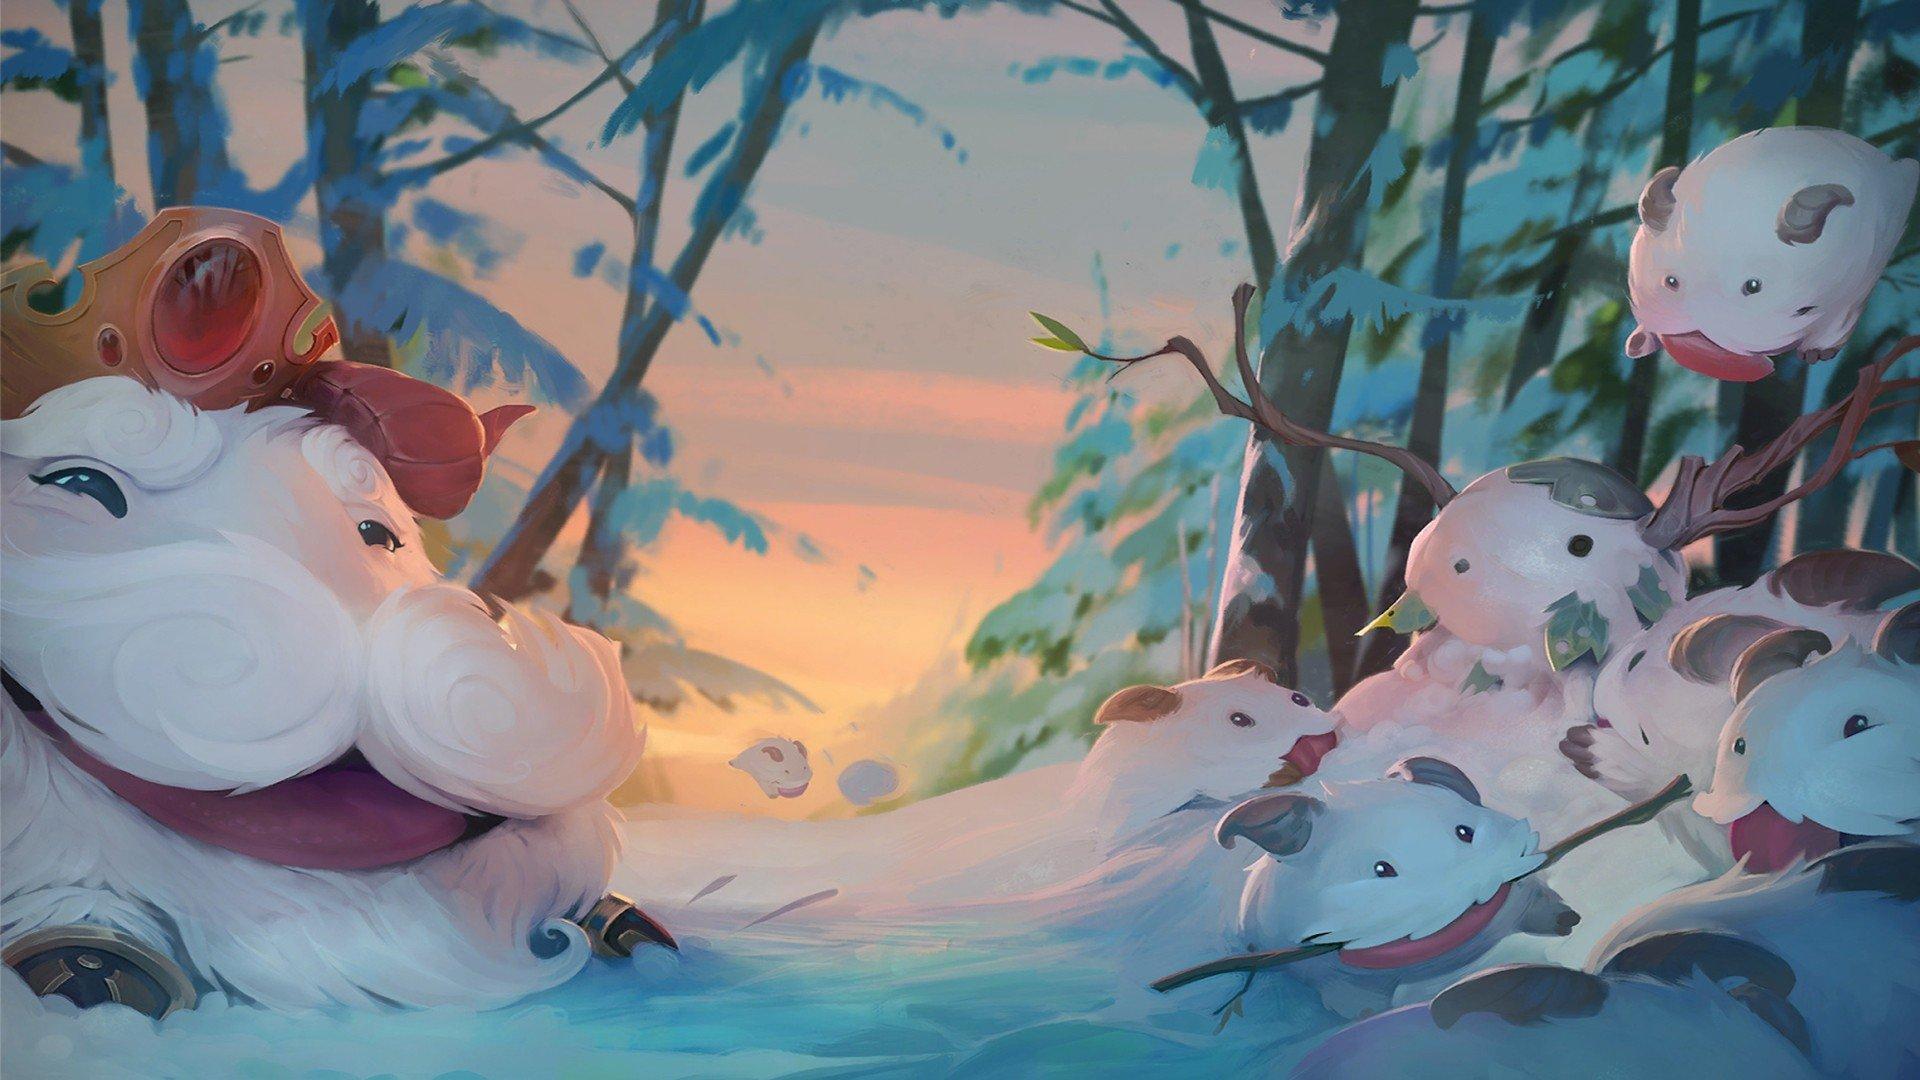 King League Of Legends Poro Winter Cartoon Summoner 039 S